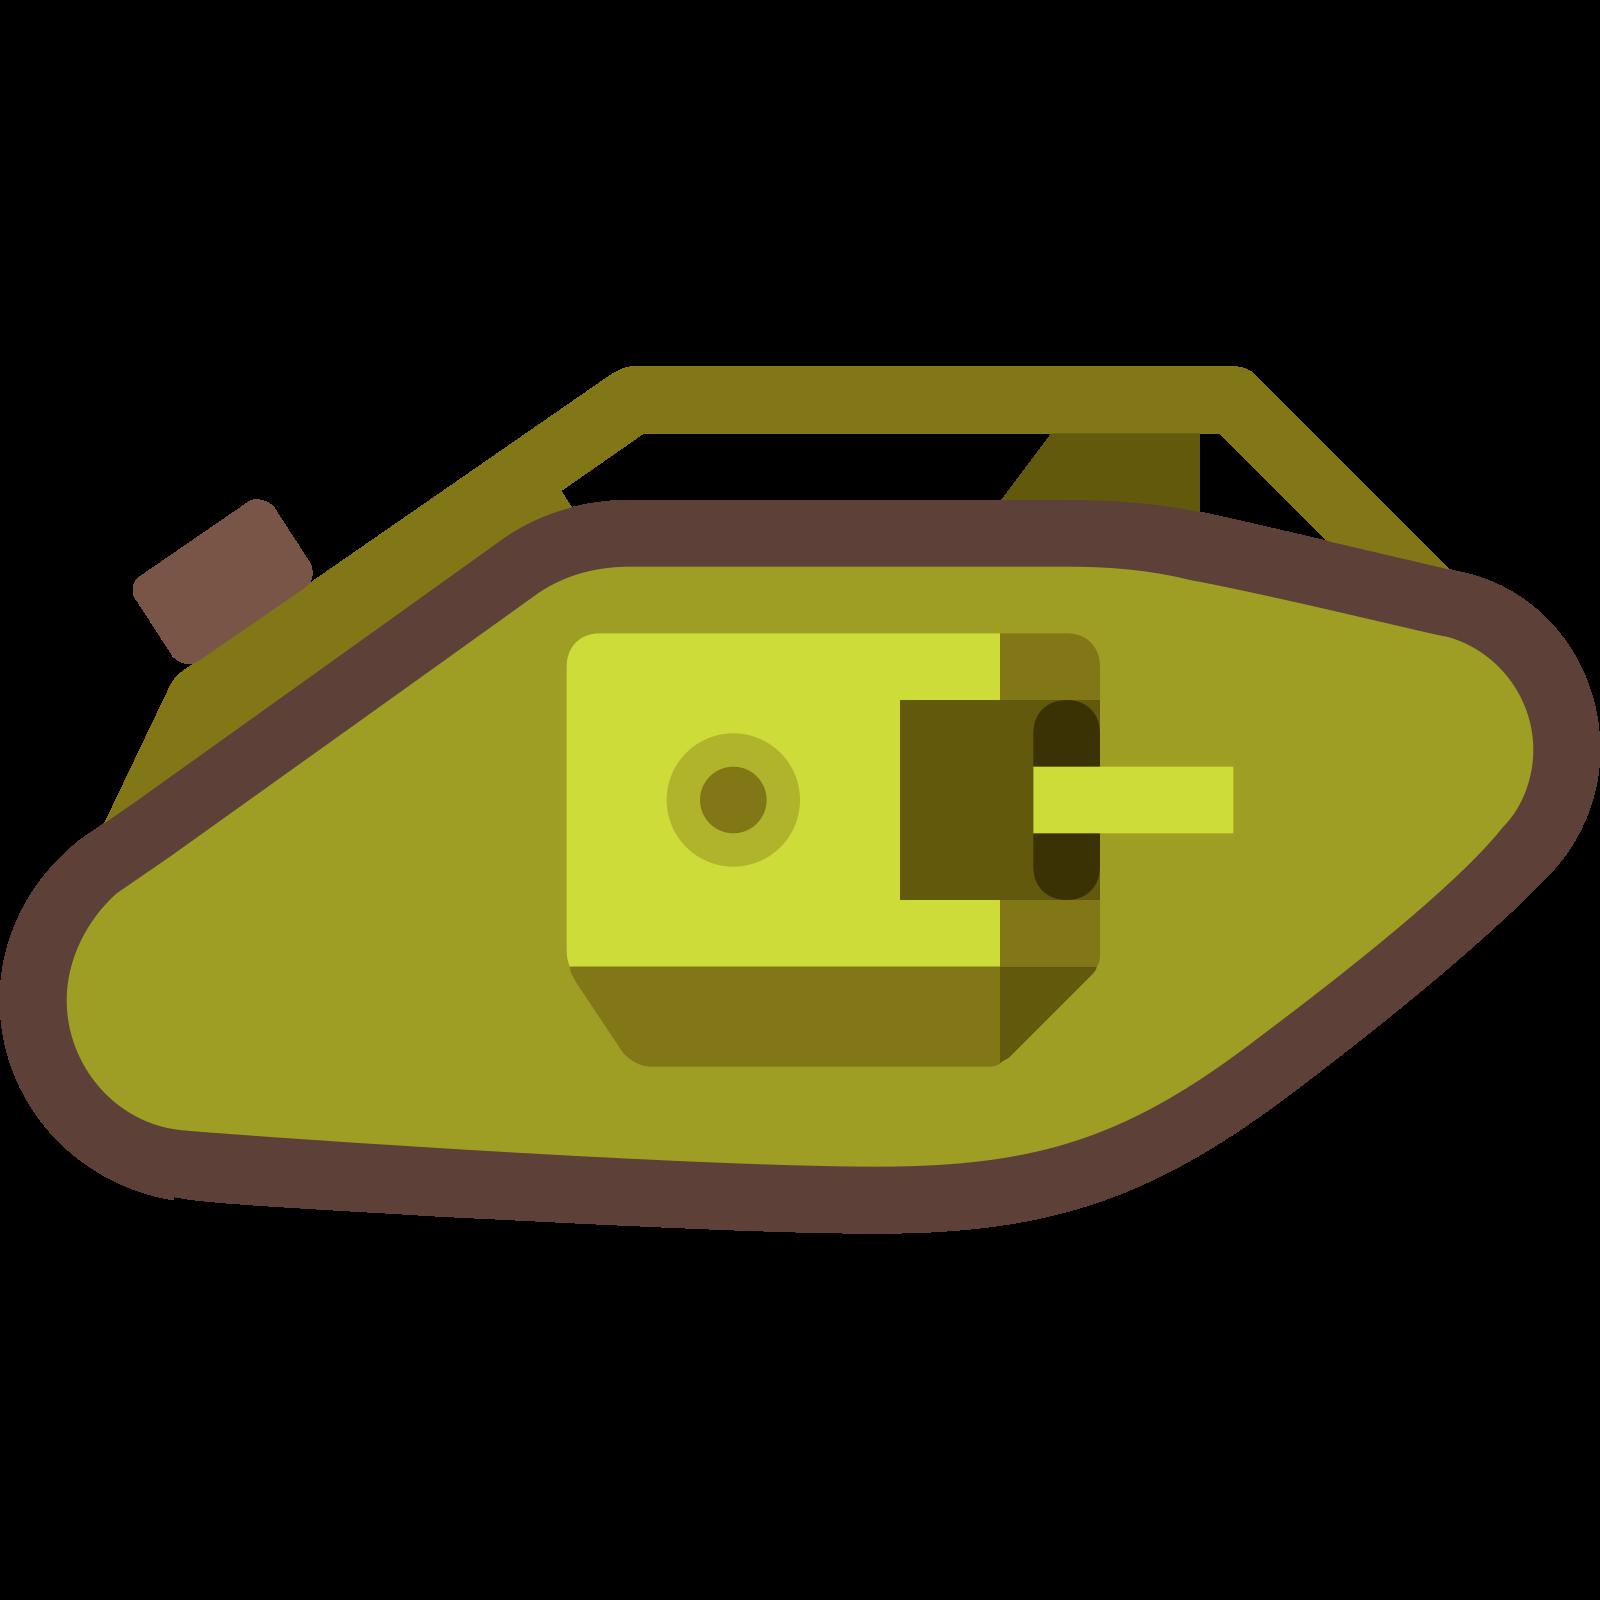 Mark IV Tank icon